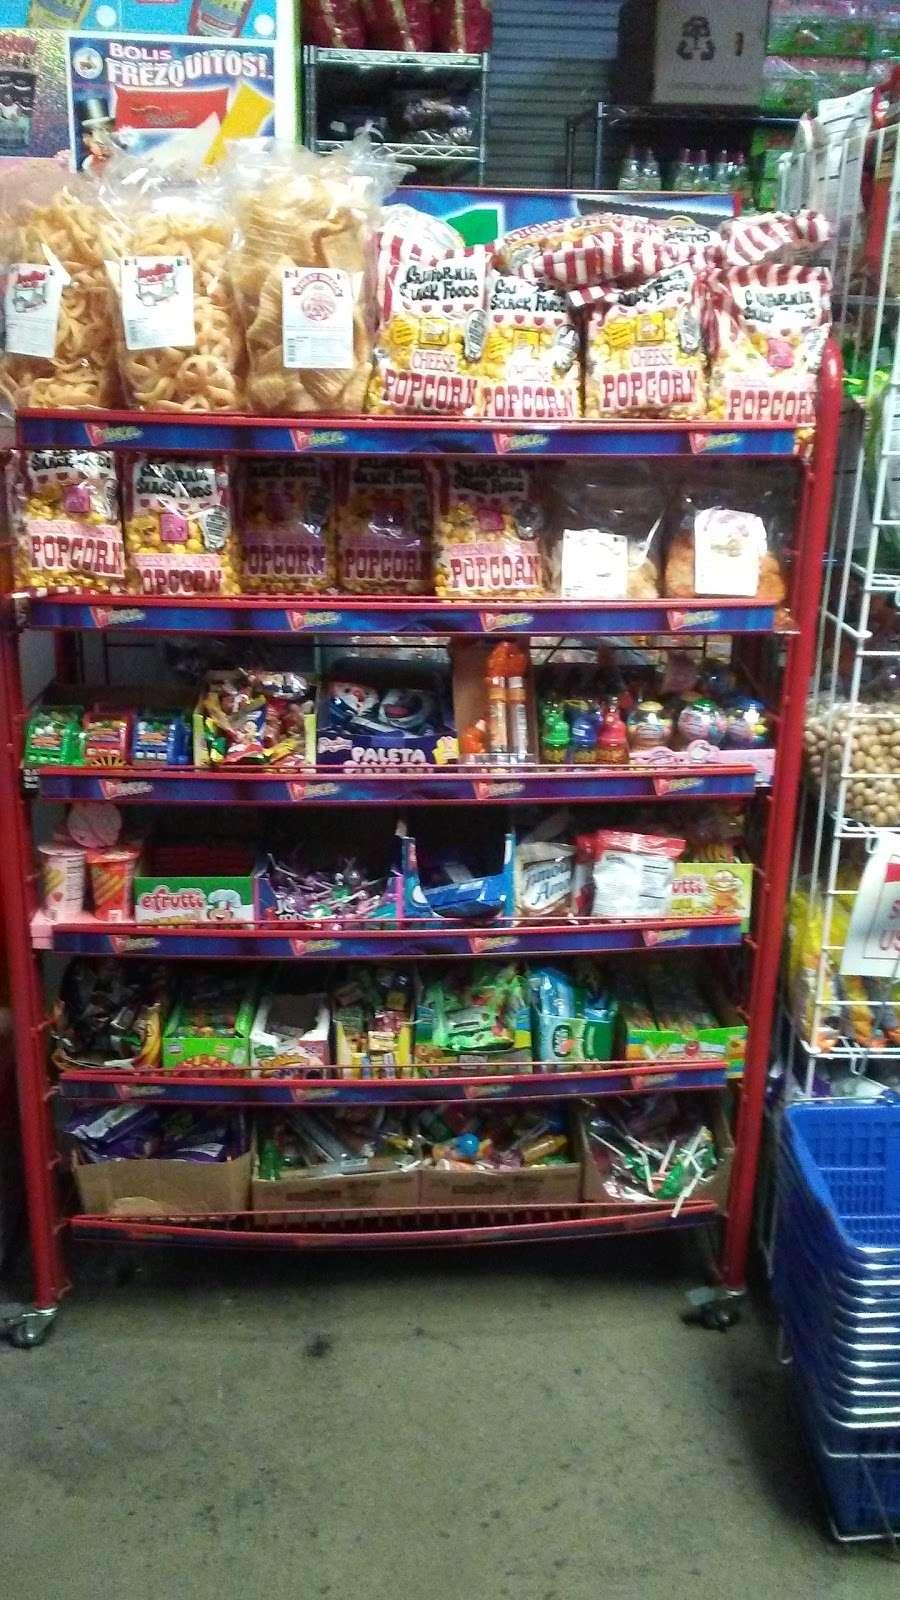 Paleteria Hidalgo - store    Photo 6 of 10   Address: 16565 Orange Way # I, Fontana, CA 92335, USA   Phone: (909) 350-4130